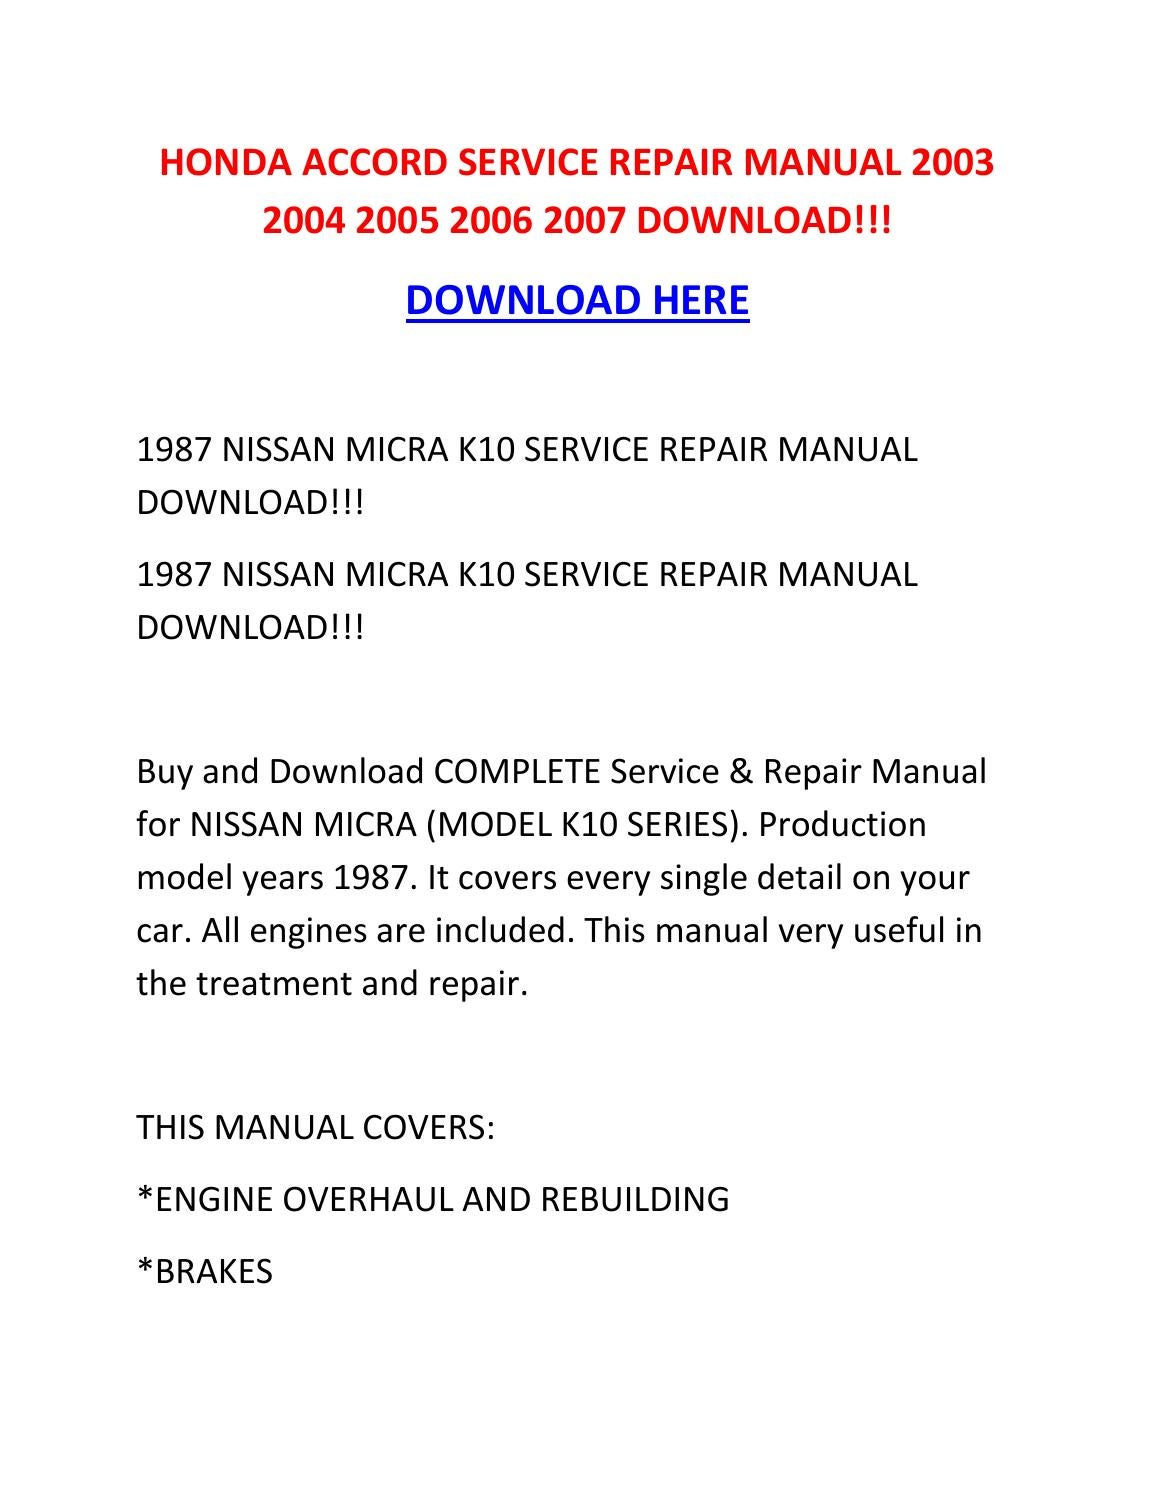 93 Honda Accord Front Suspension Diagram Free Download Wiring